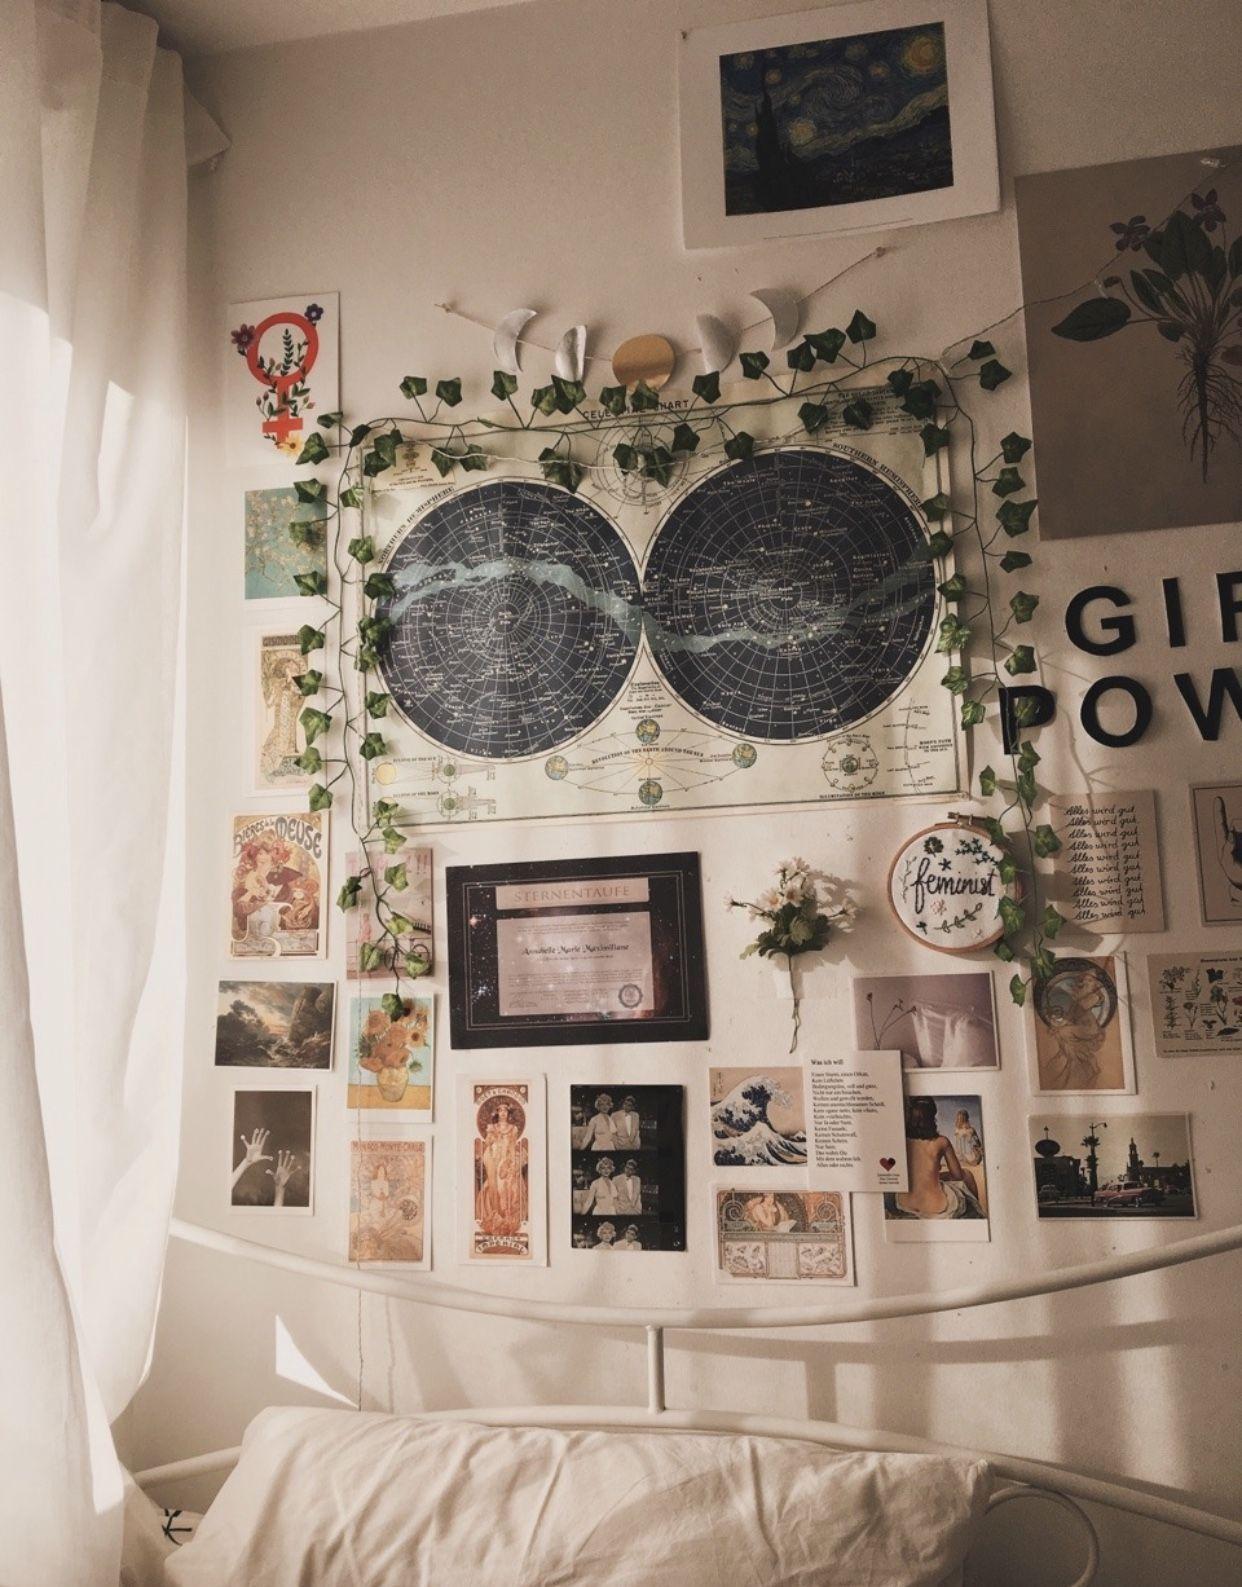 Bedroom Wall Decor Pinterest Aesthetic Room Decor Room Inspiration Vintage Room